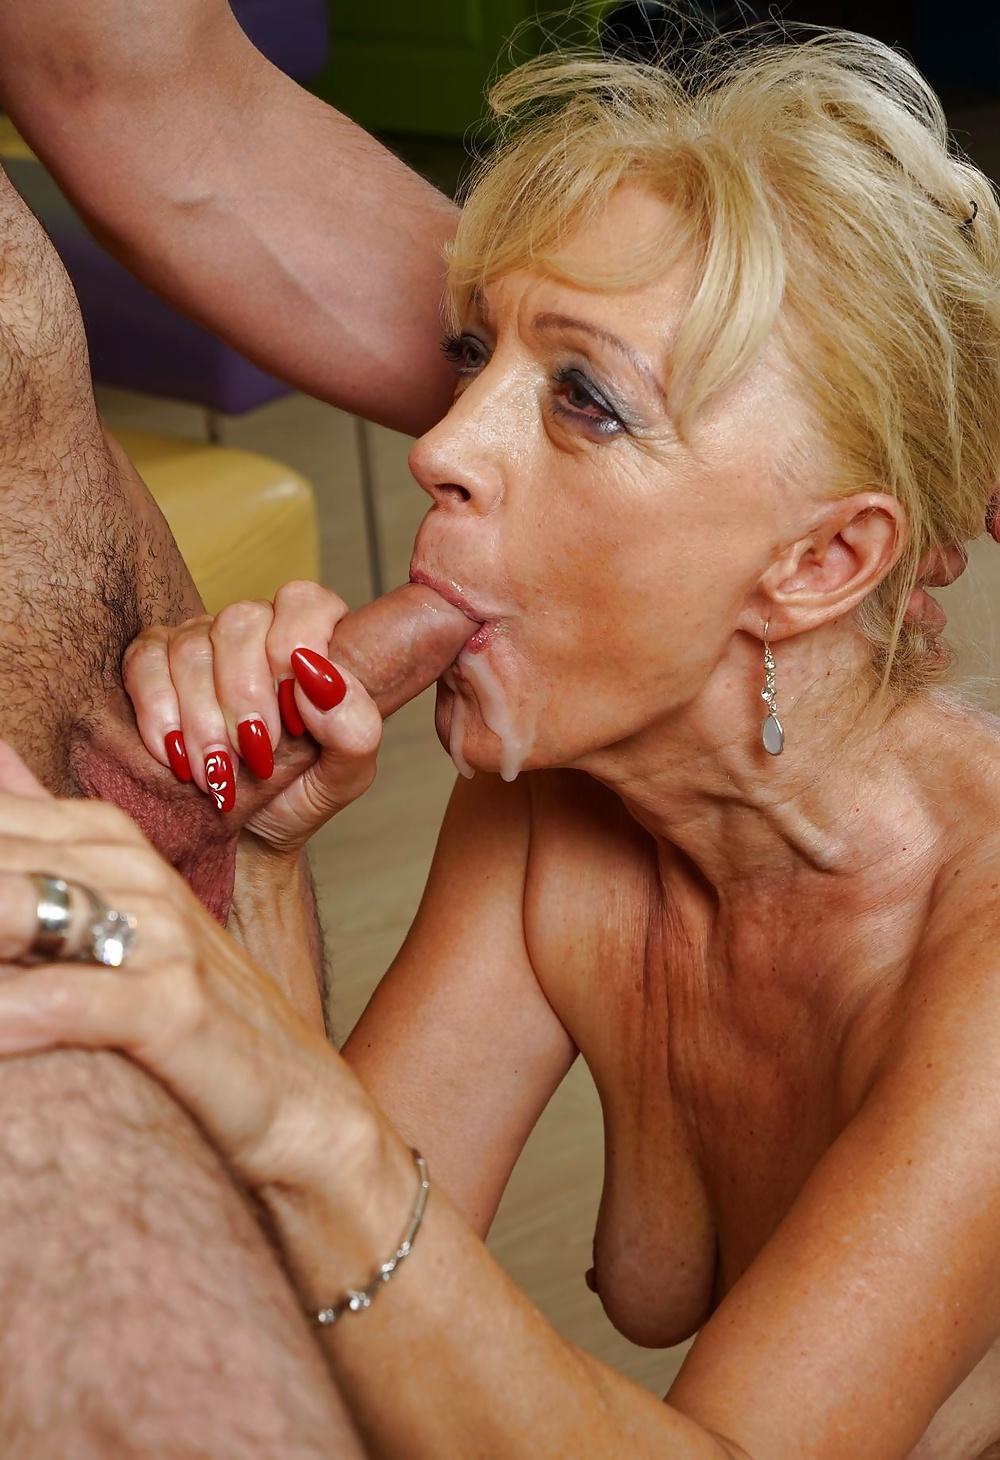 Sexbilder alte frauen 60 Granny